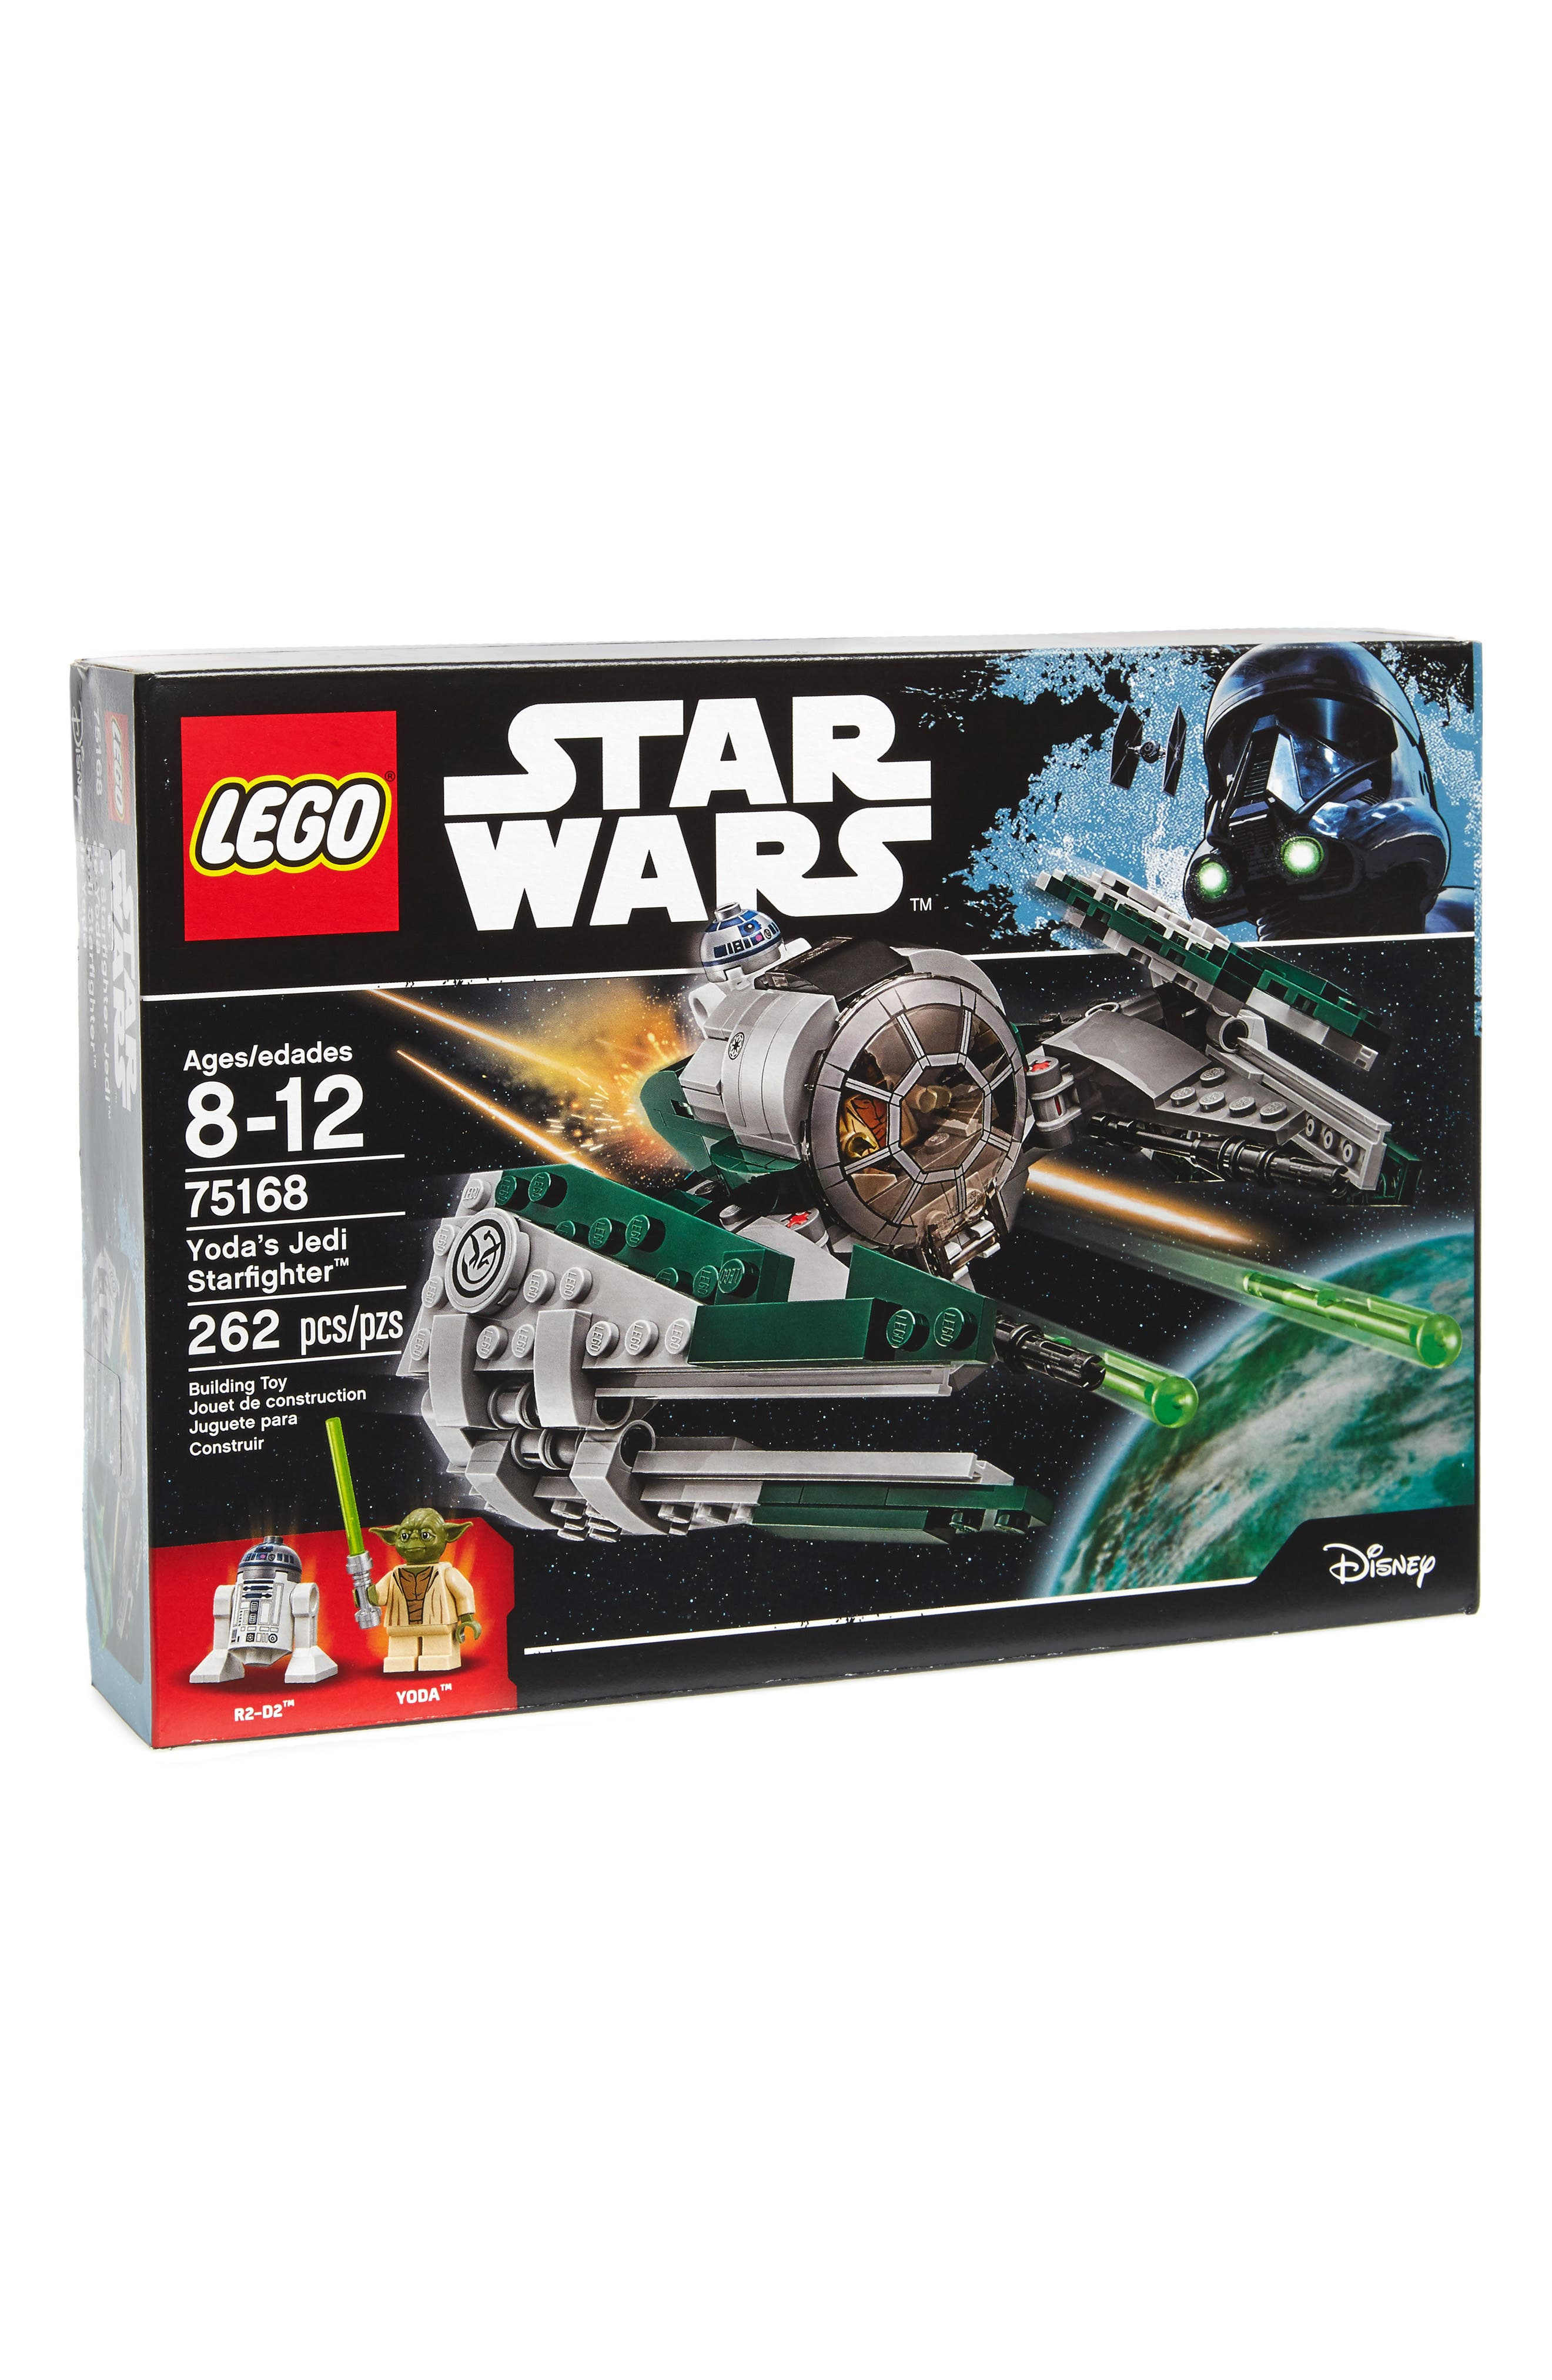 LEGO® Star Wars® Yoda's Jedi Starfighter - 75168